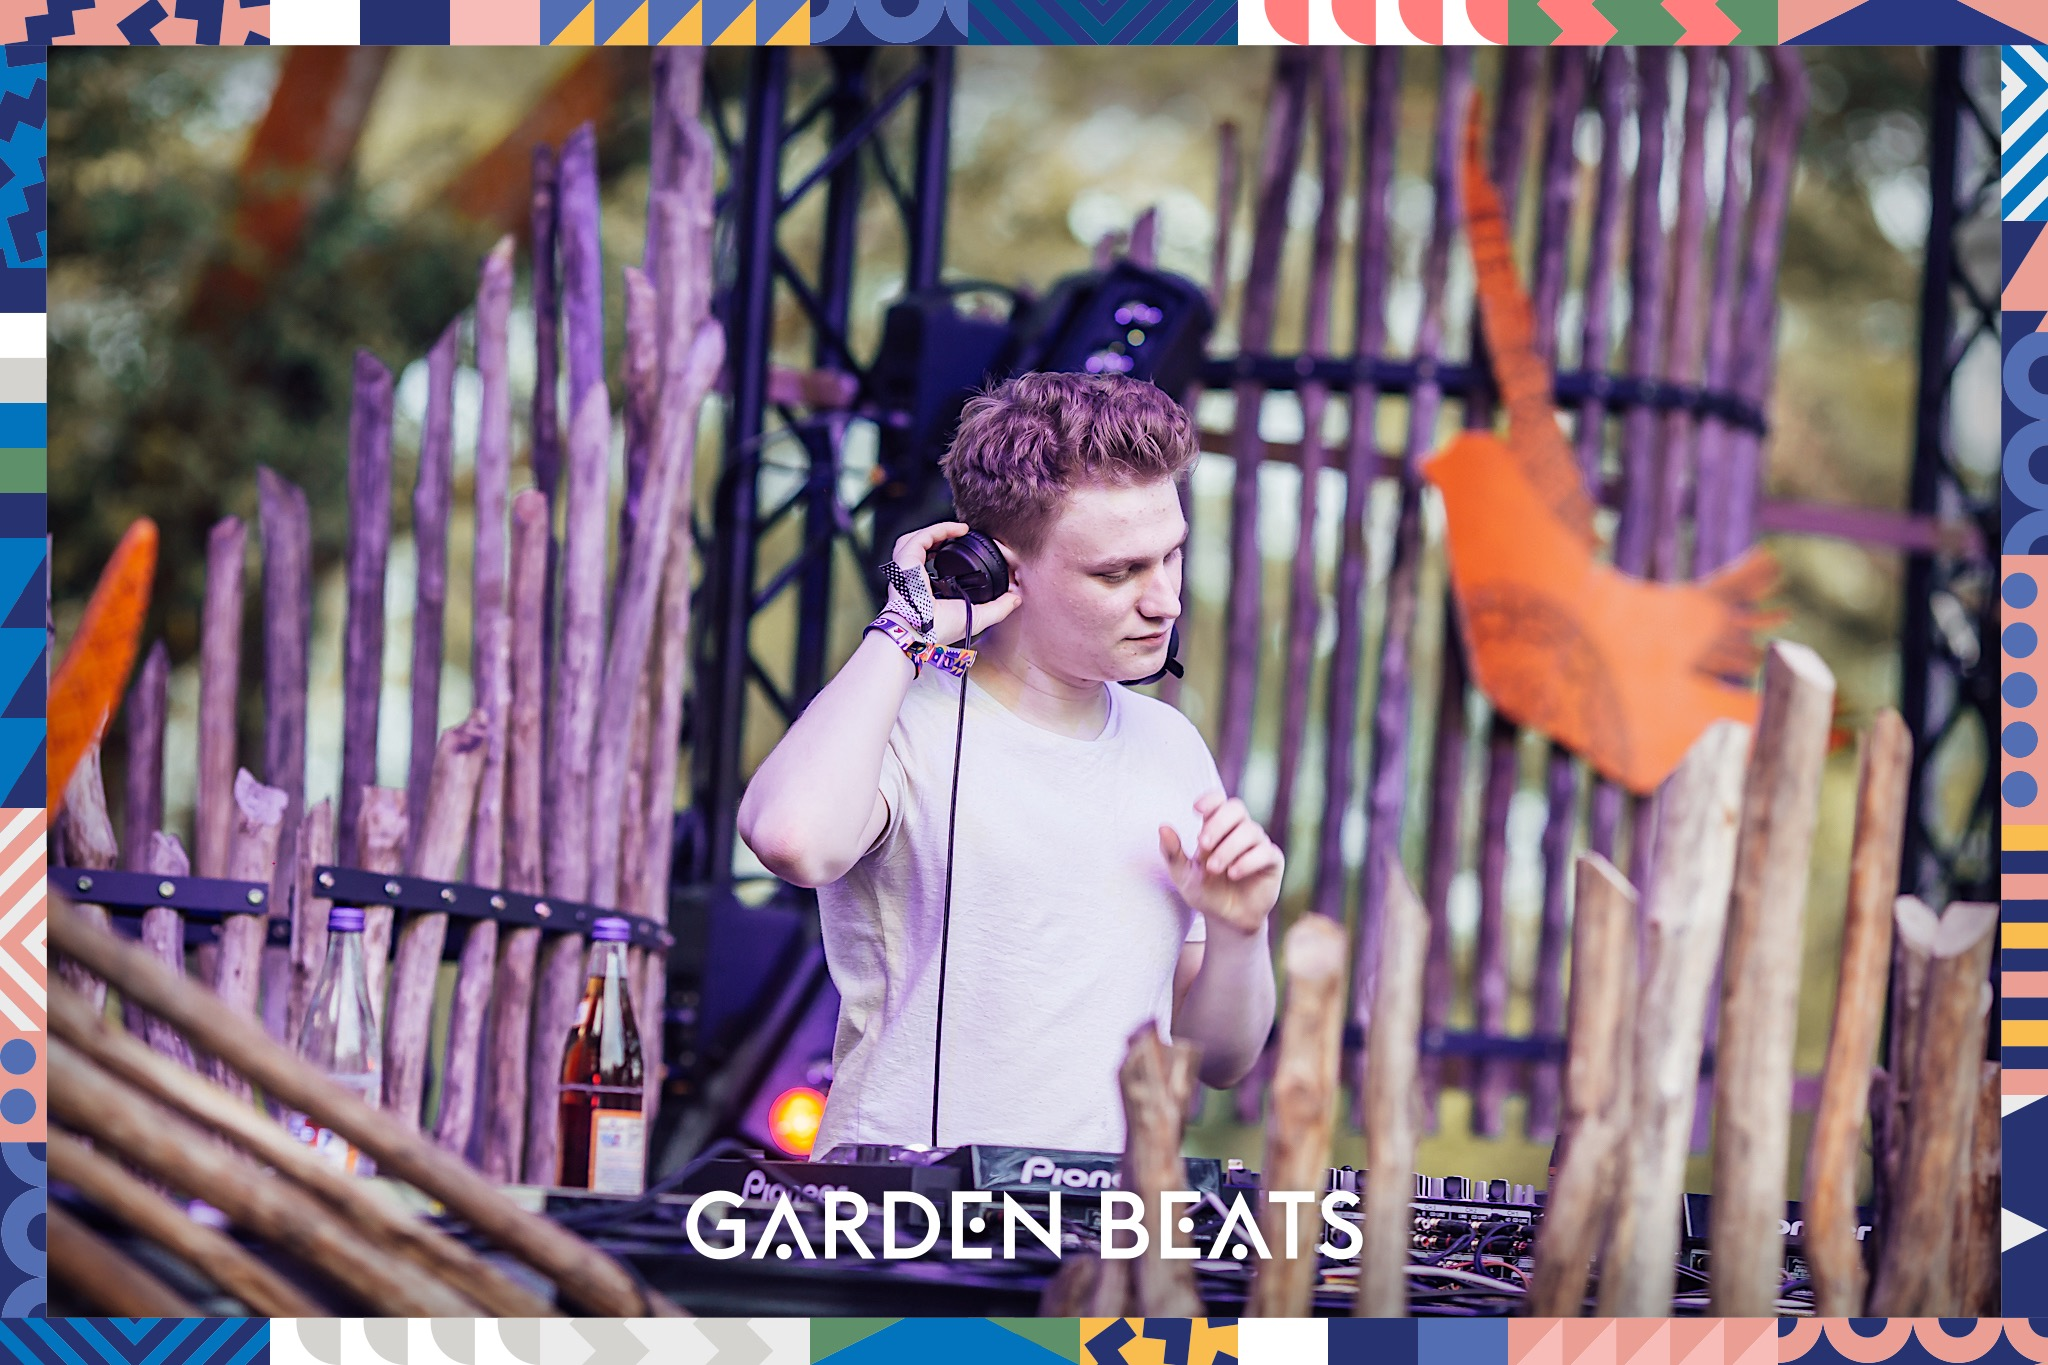 18032017_GardenBeats_Colossal589_WatermarkedGB.jpg